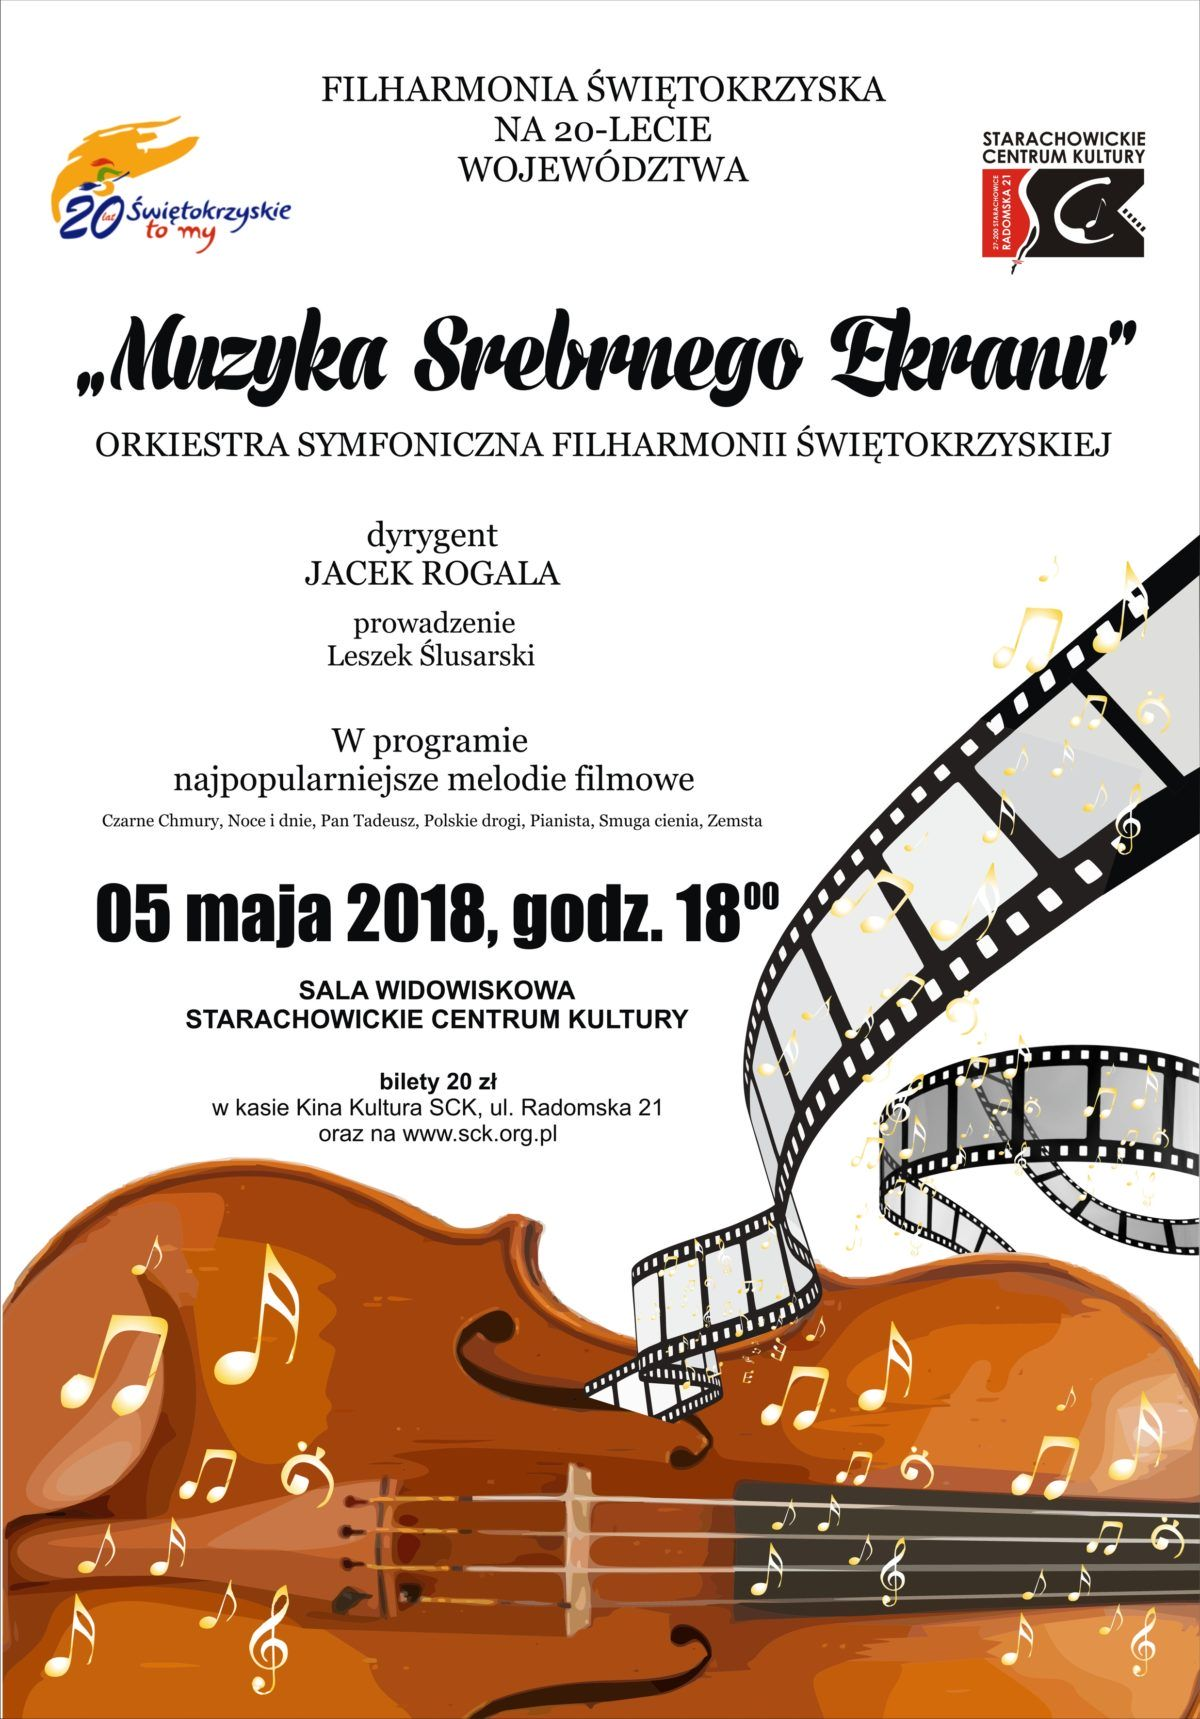 Archiwum SCK. Muzyka srebrnego ekranu